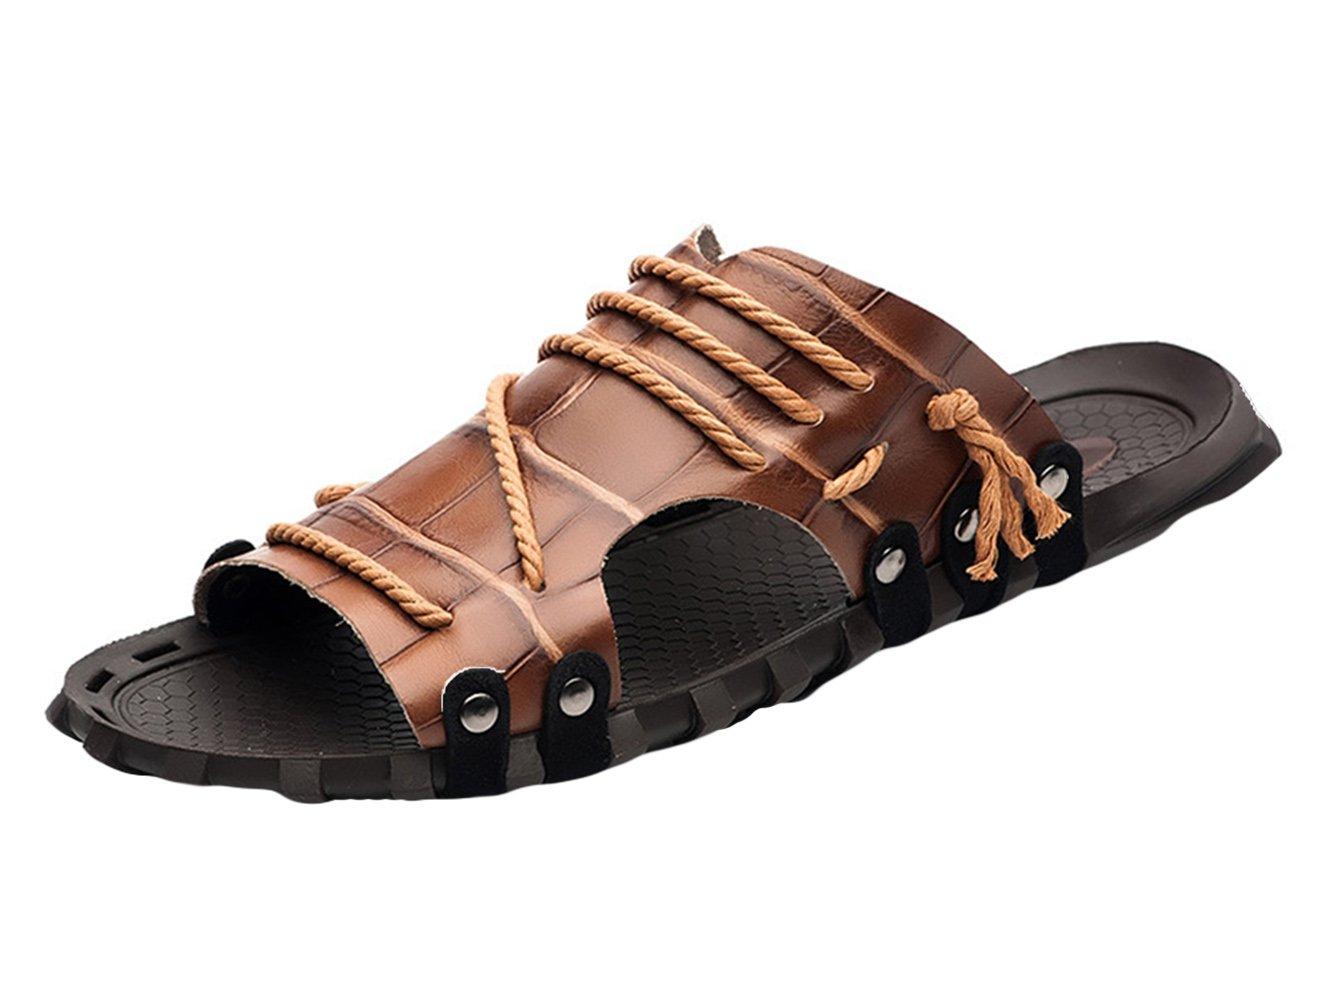 Insun Zapatilla de Cuero Para Hombre Sandalias de Playa 37 EU|Marrón 2